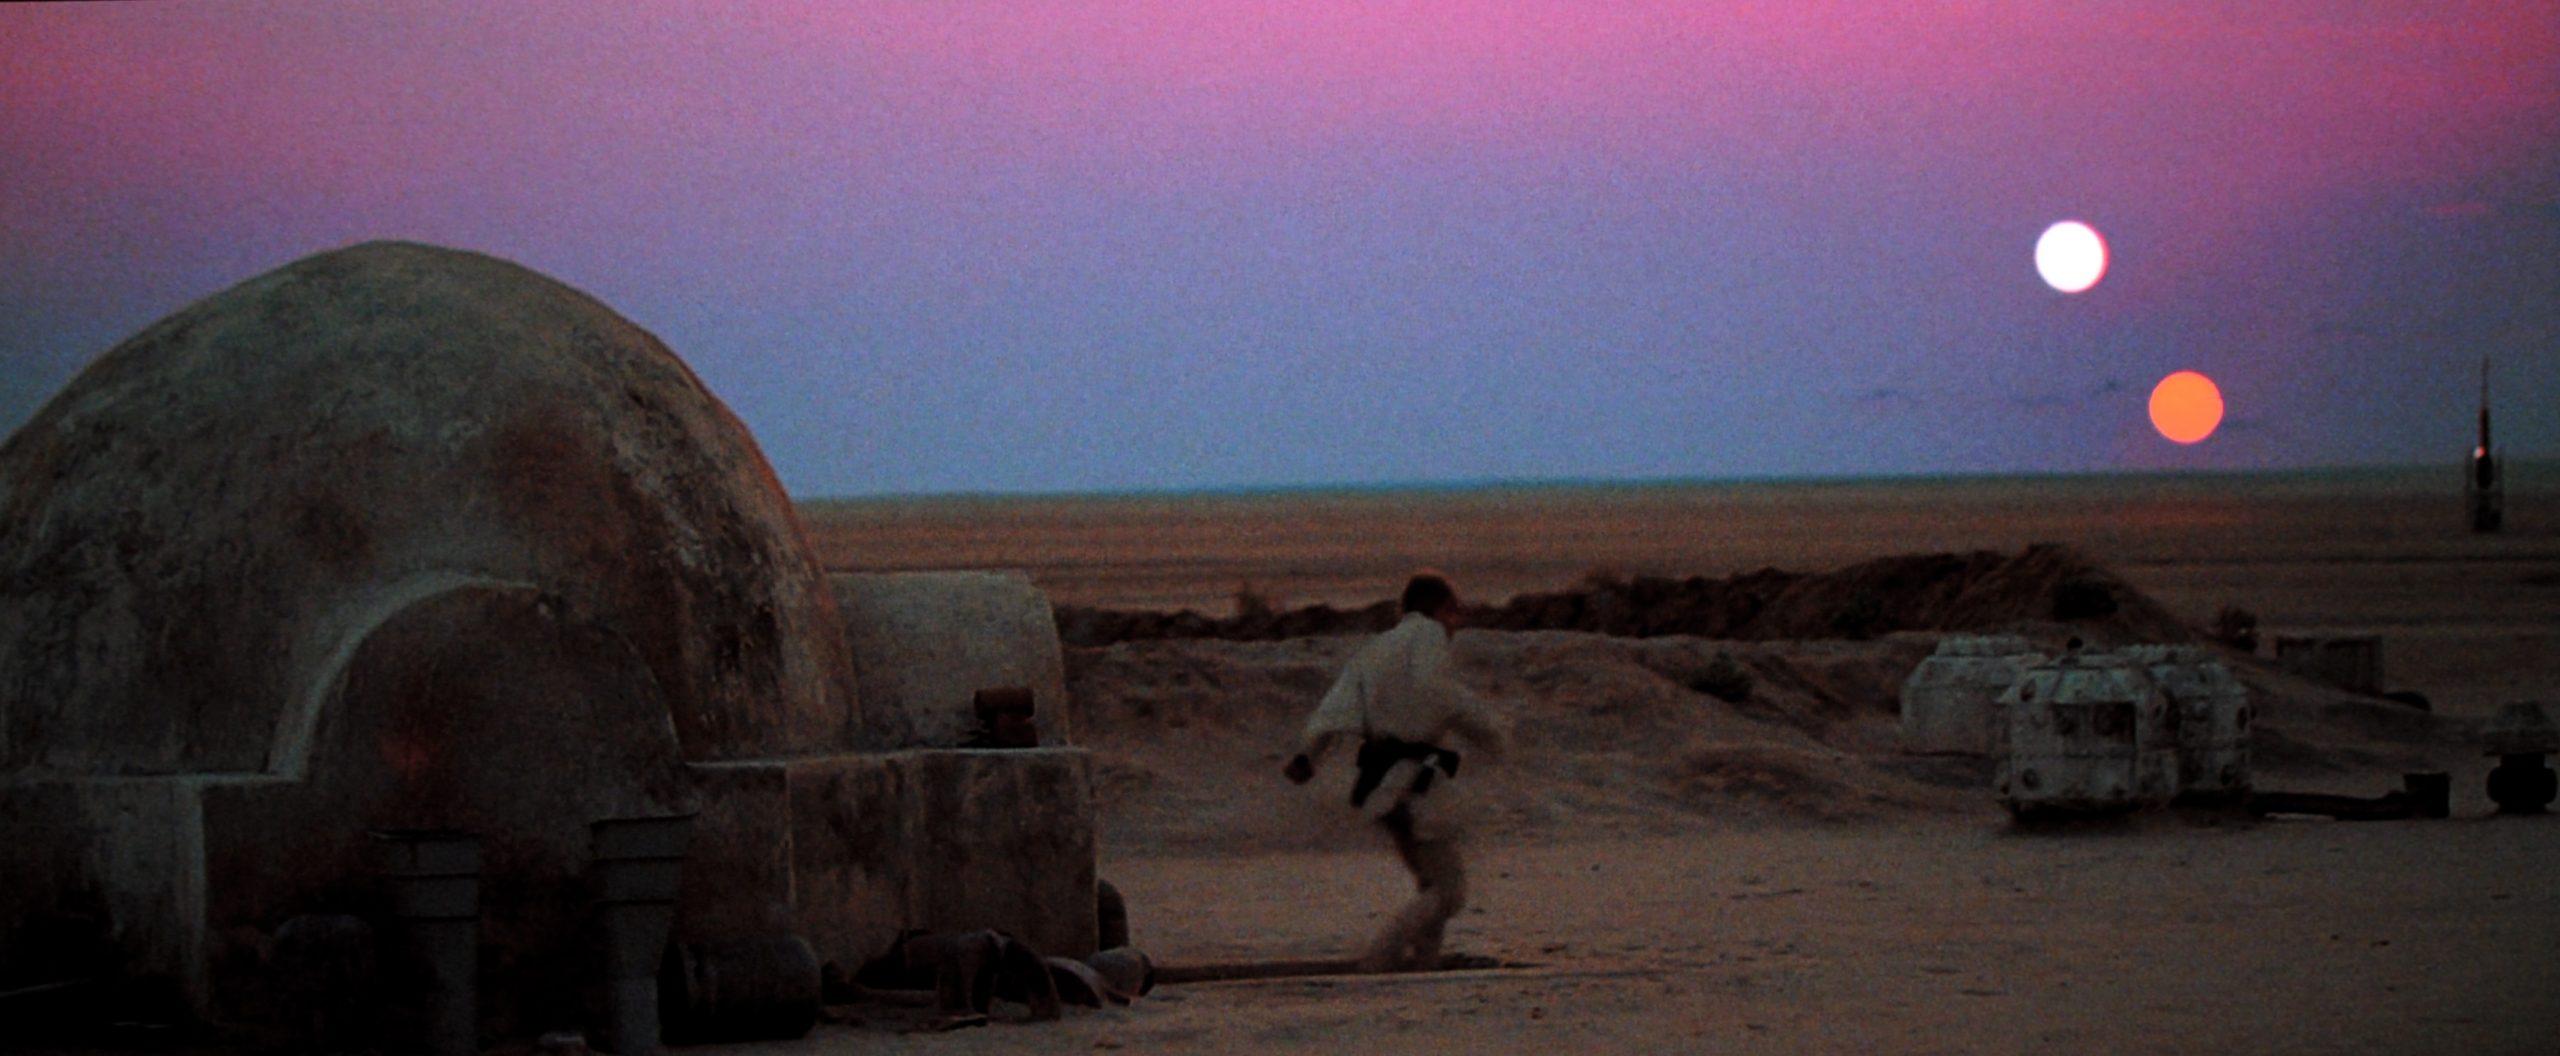 UHD Disney+ Blu-ray Kritik | Star Wars - Eine neue ...  UHD Disney+ Blu...